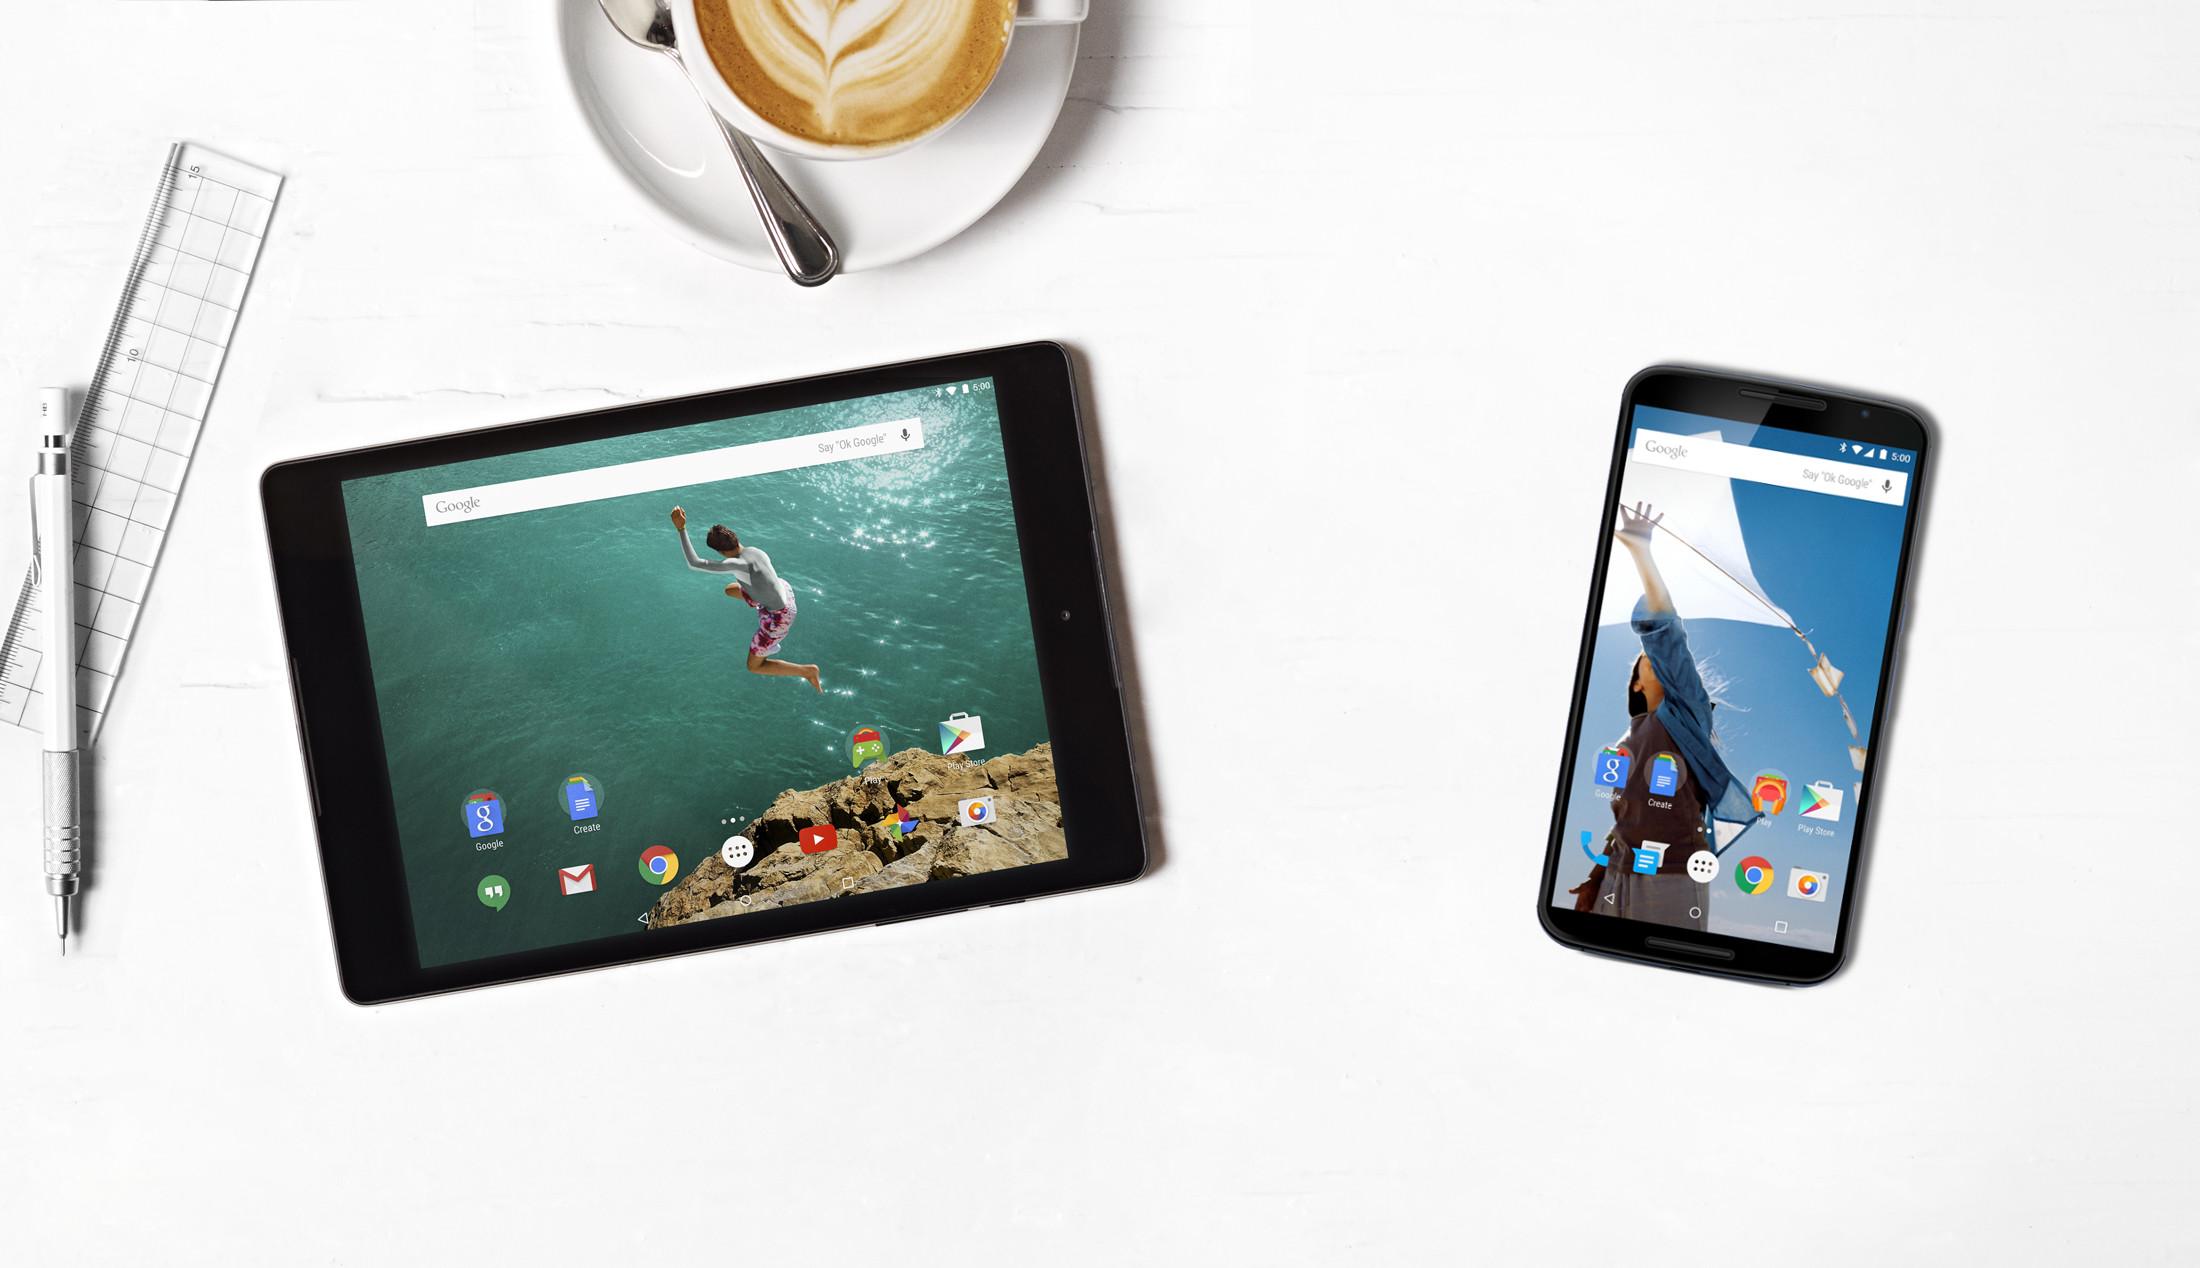 Dynamic Duo: The Nexus 6 and Nexus 9